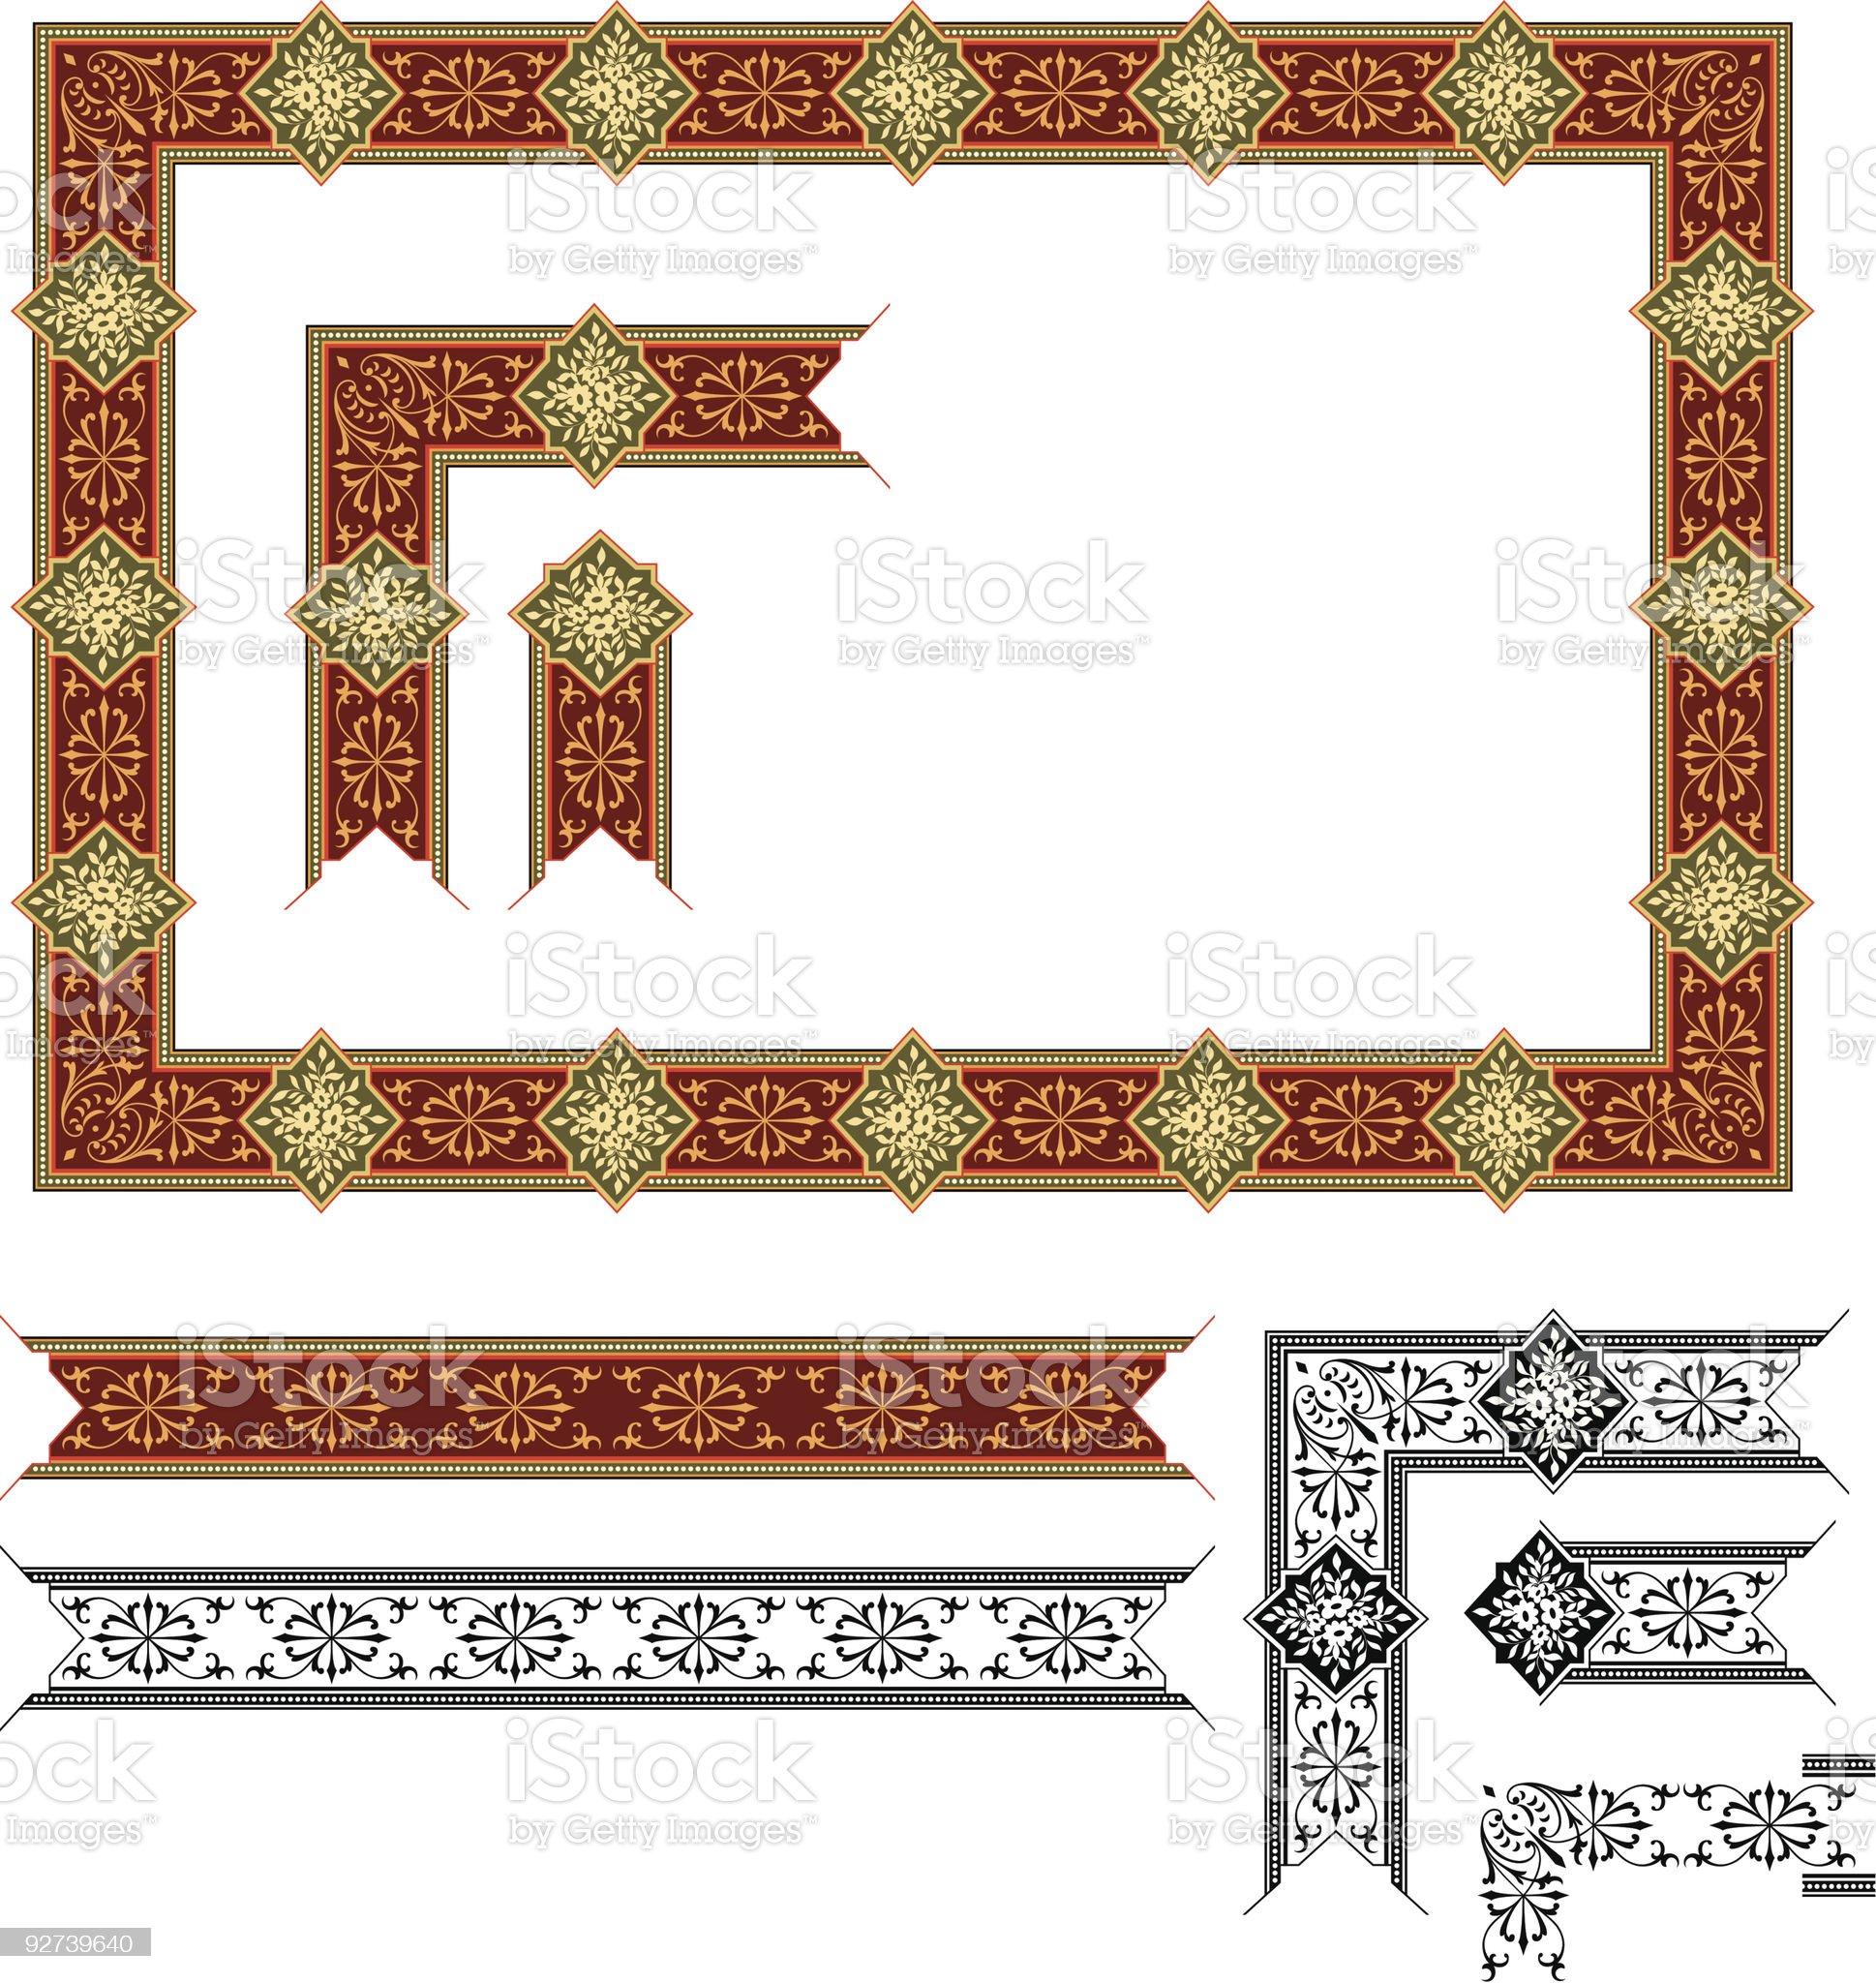 Scrolled Frame Design (Vector) royalty-free stock vector art